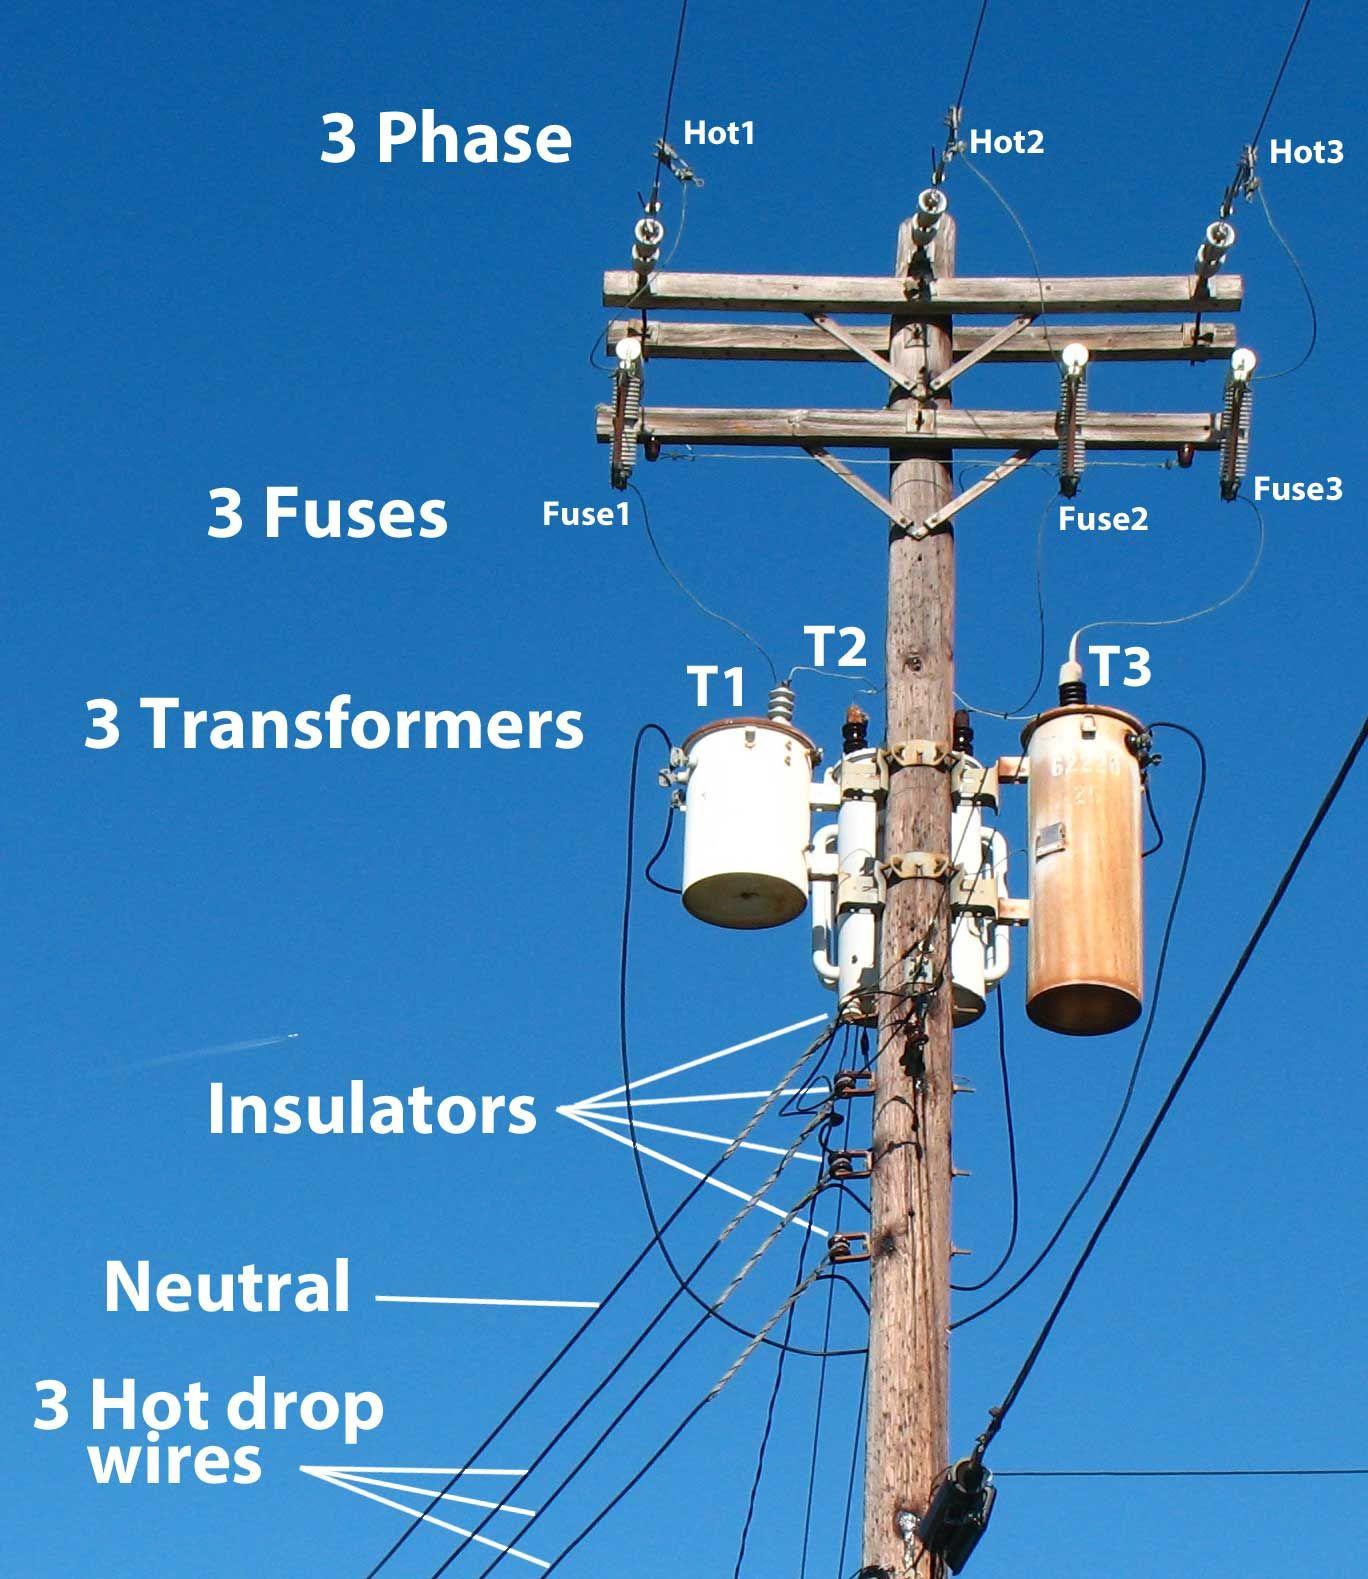 3-phase-transformers-IMG_2333-1500.jpg (JPEG слика, 1368 ...